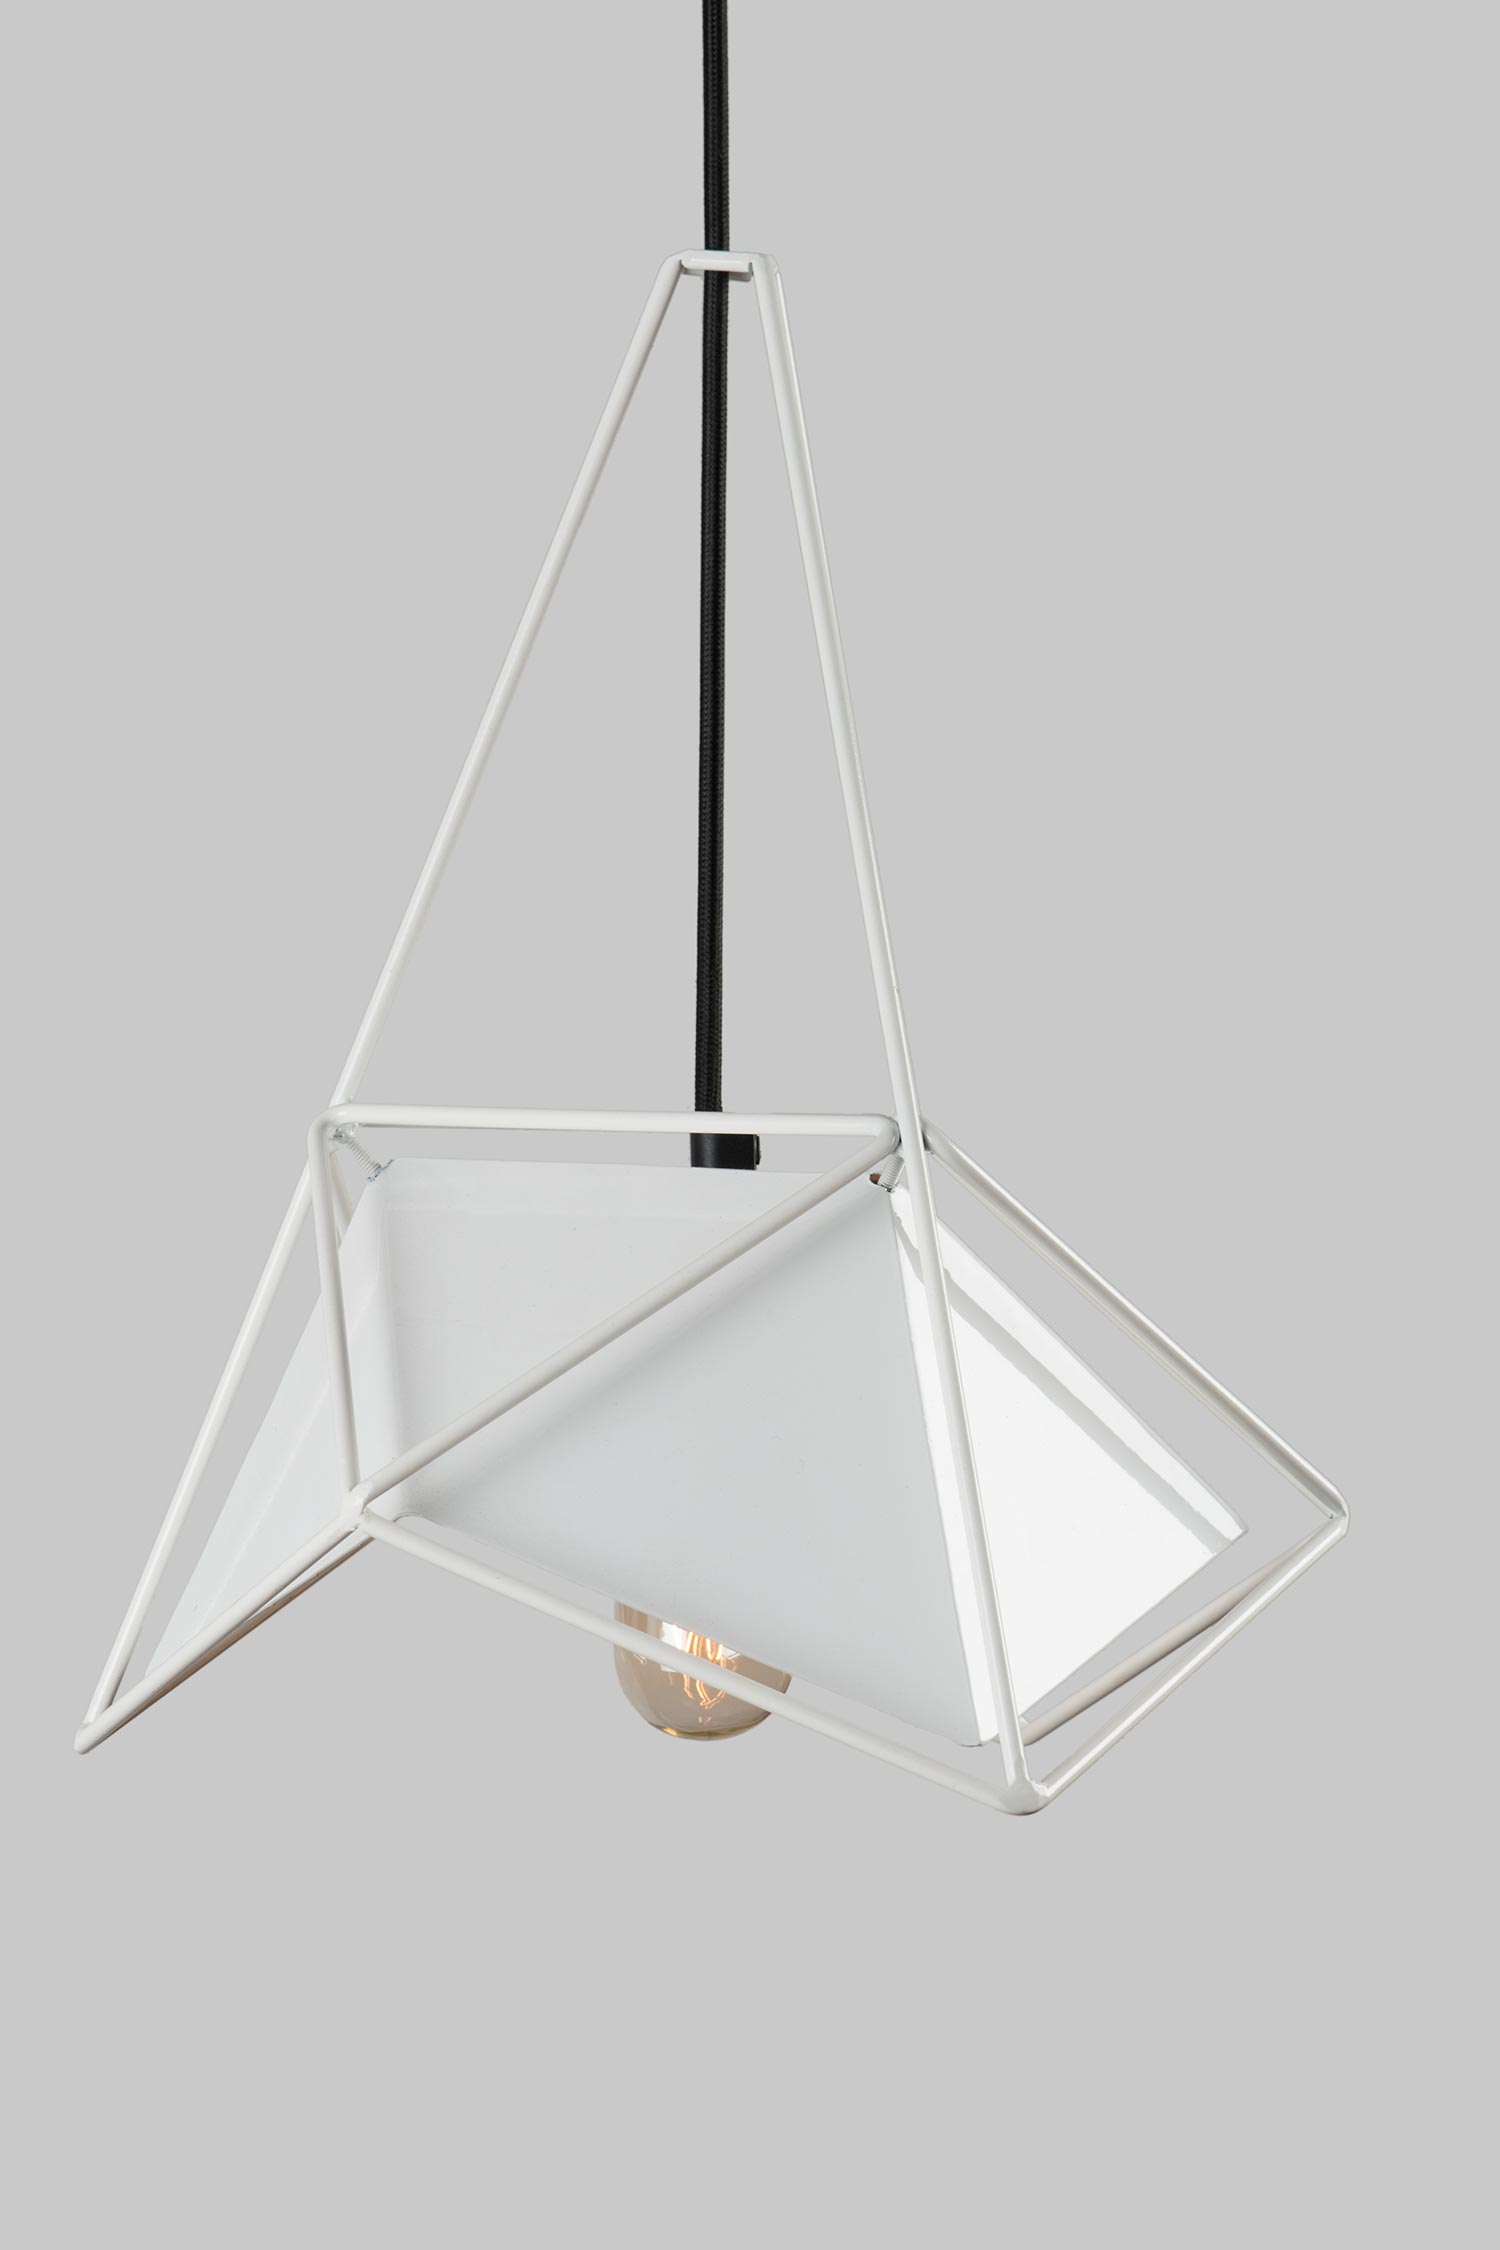 U32-1 Pendant Lamp by SHIFT for Lampslite